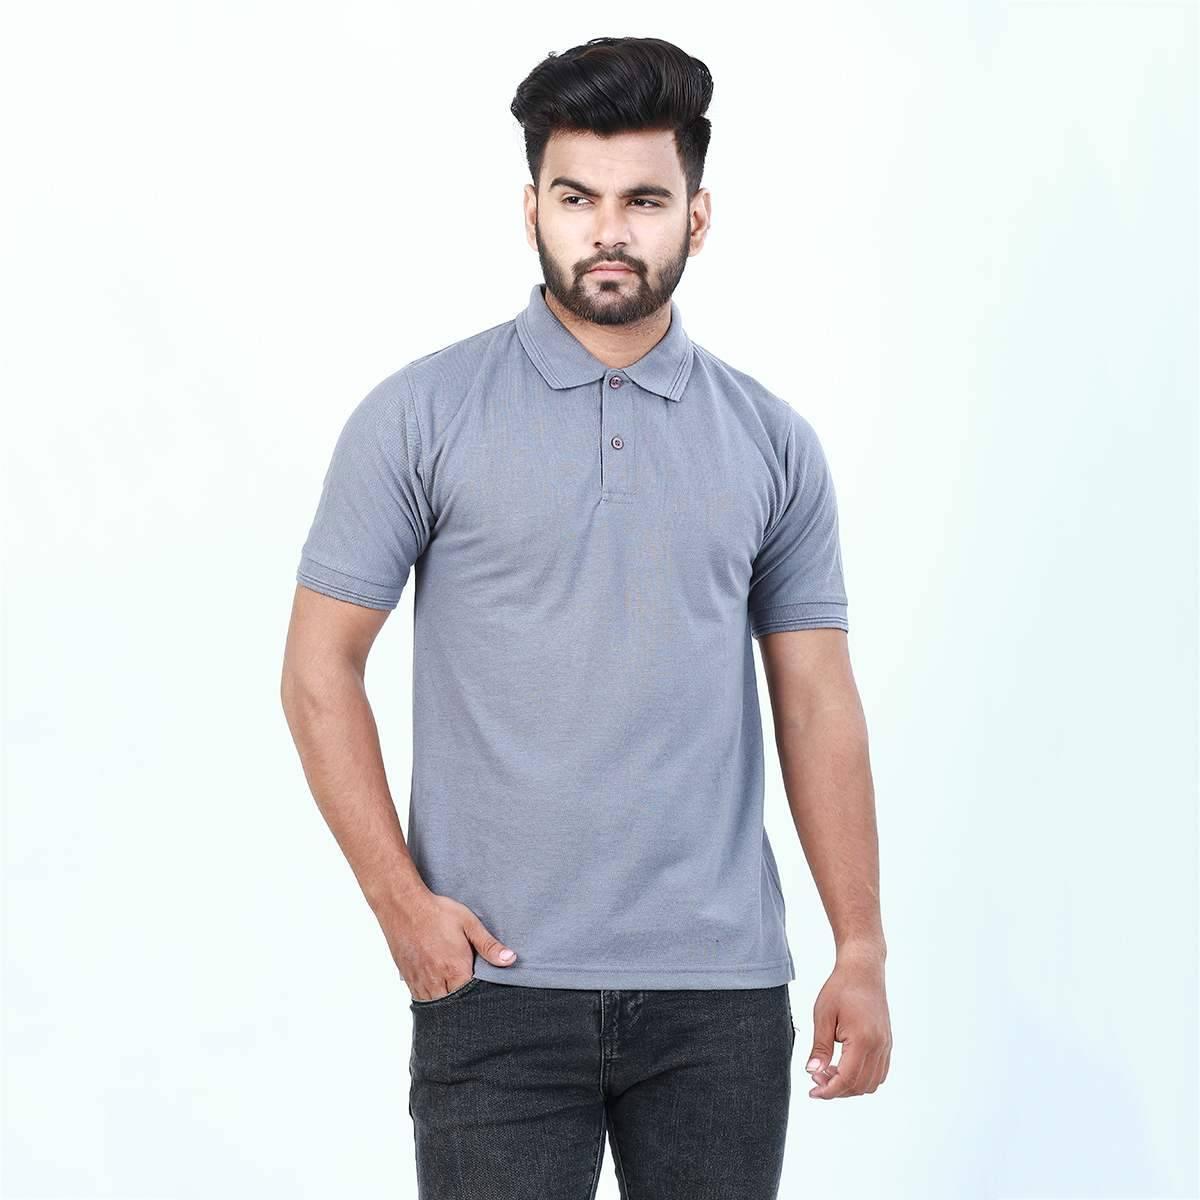 Anace Grey 100% Cotton Polo Shirt for Men's